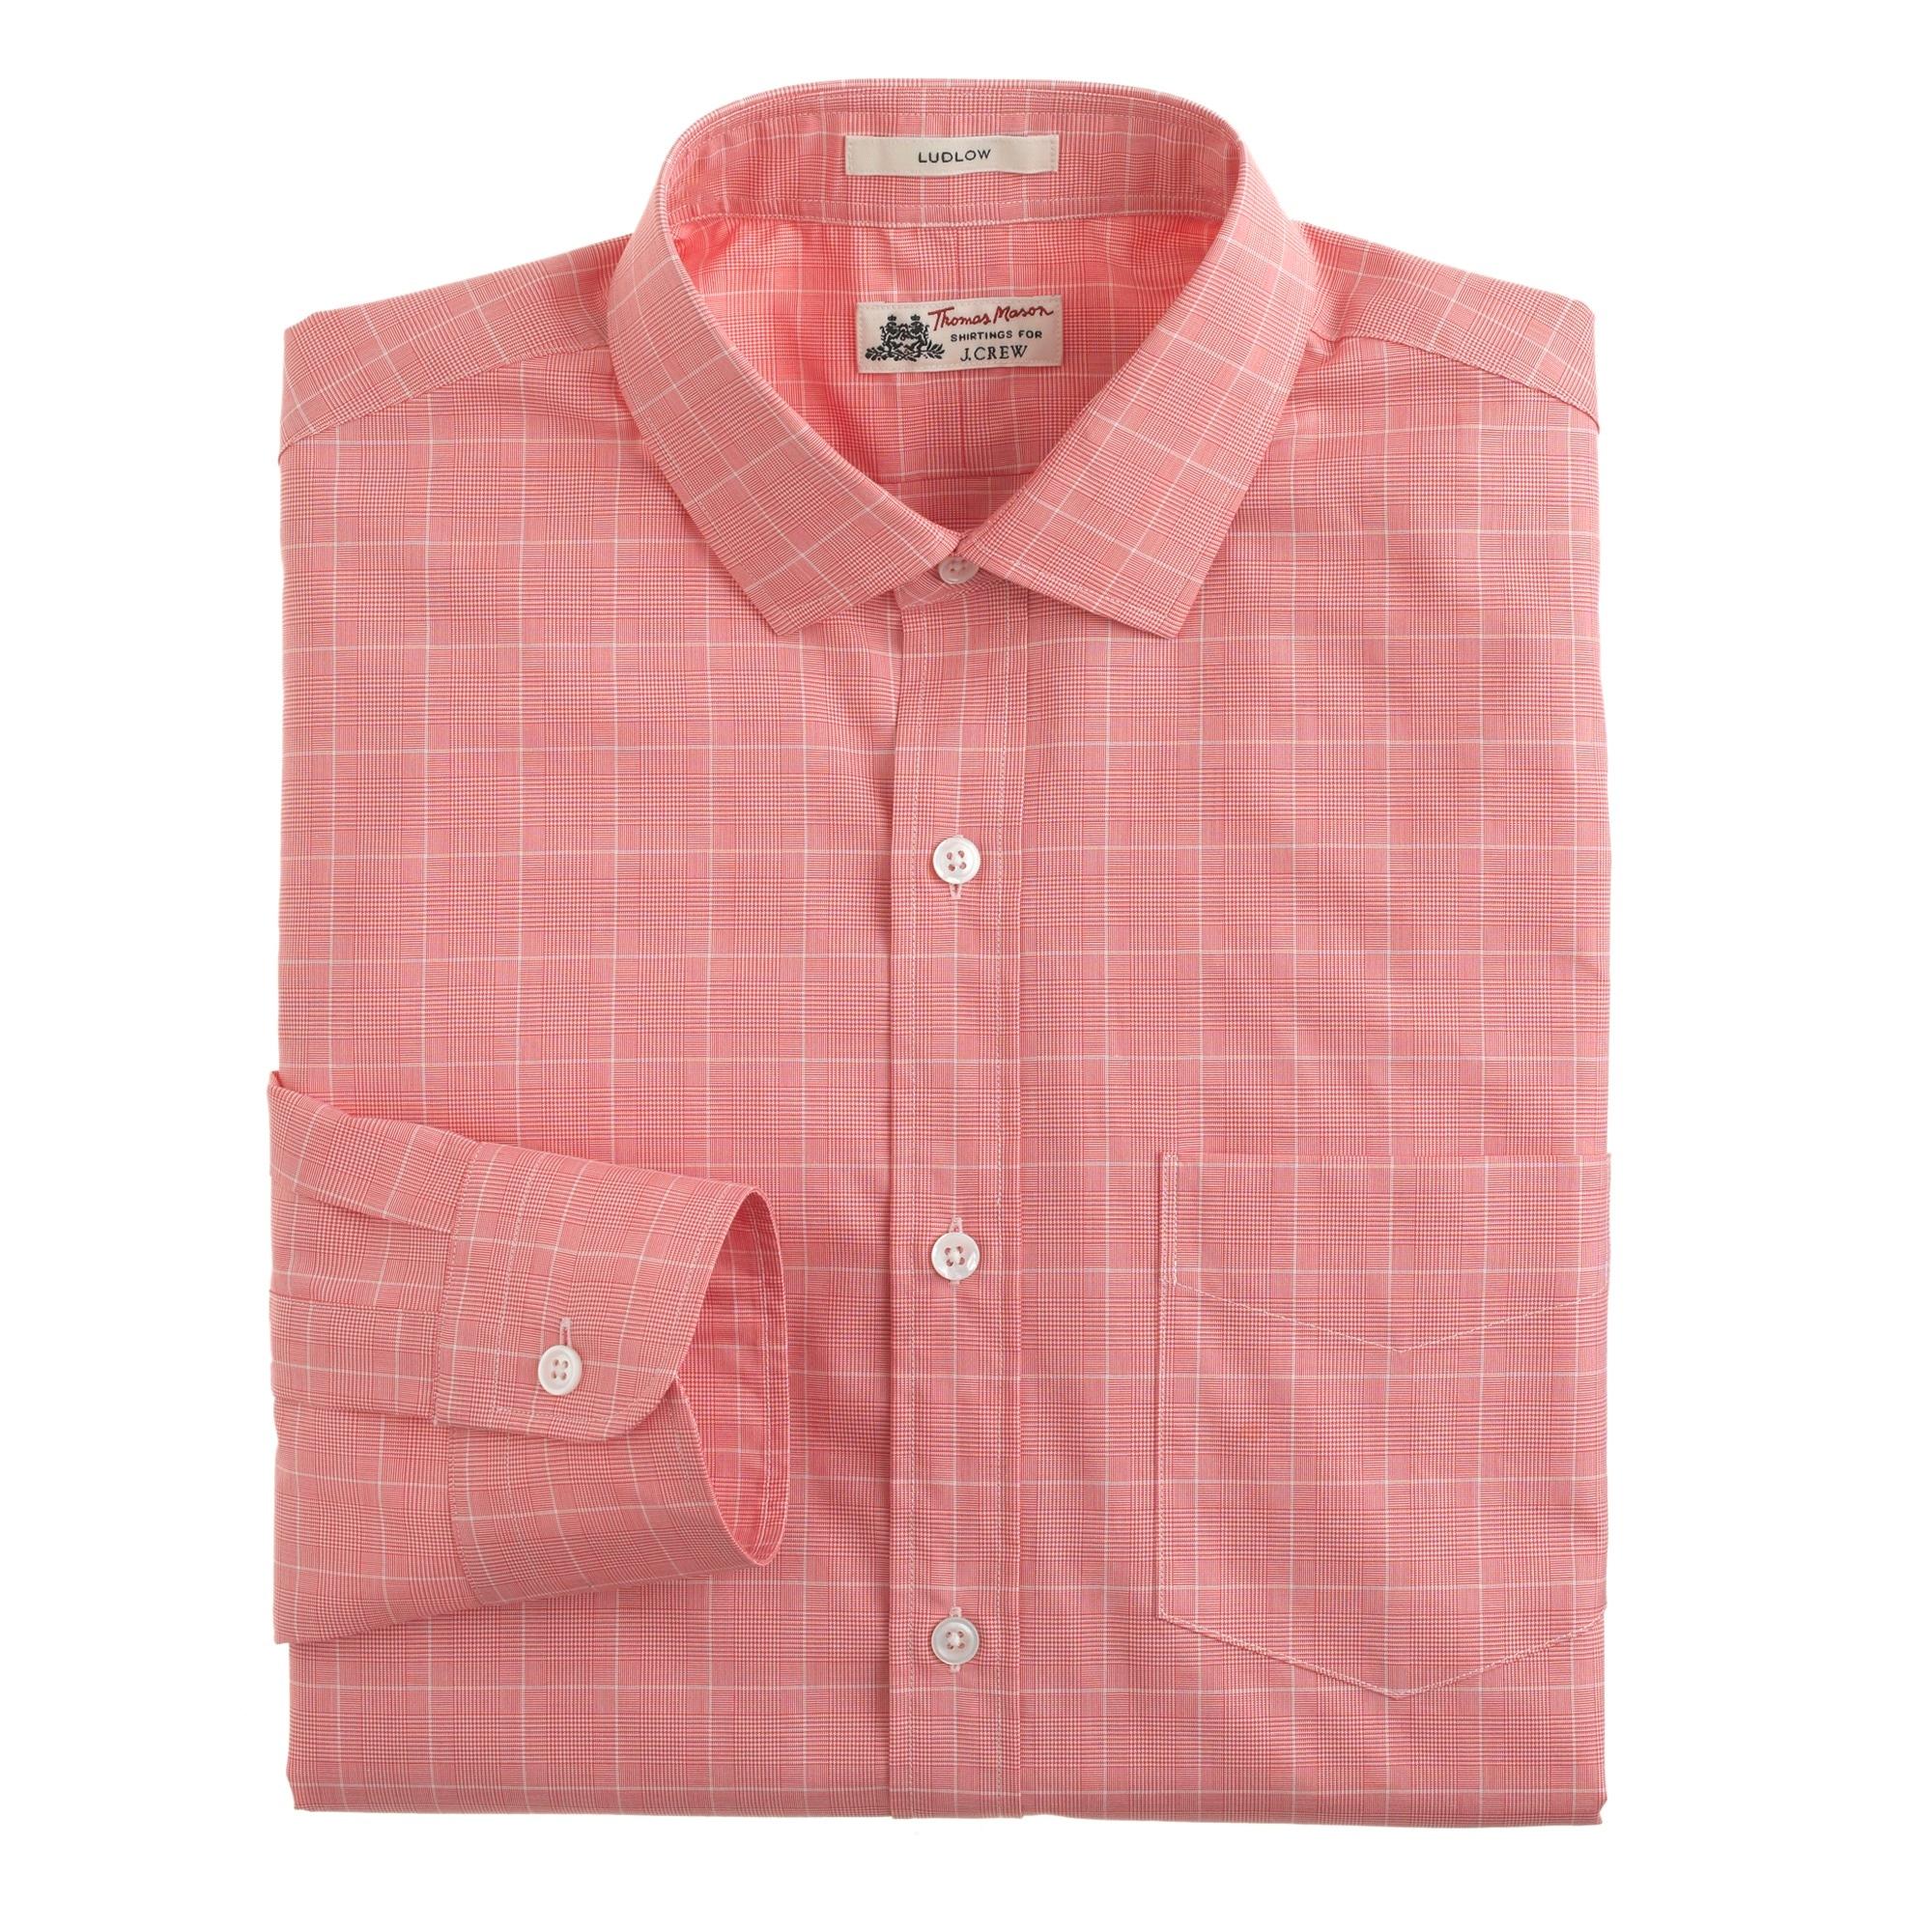 thomas mason® for j.crew ludlow shirt in calypso orange : men thomas mason for j.crew